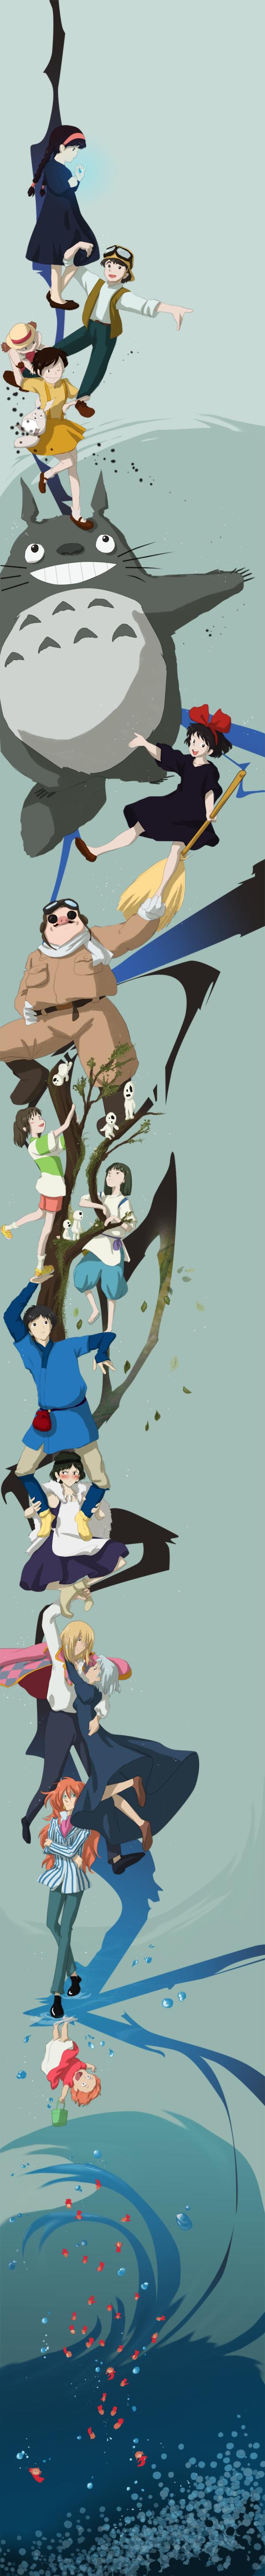 An Assortment of Amazing Studio Ghibli Inspired Art   Studio ...